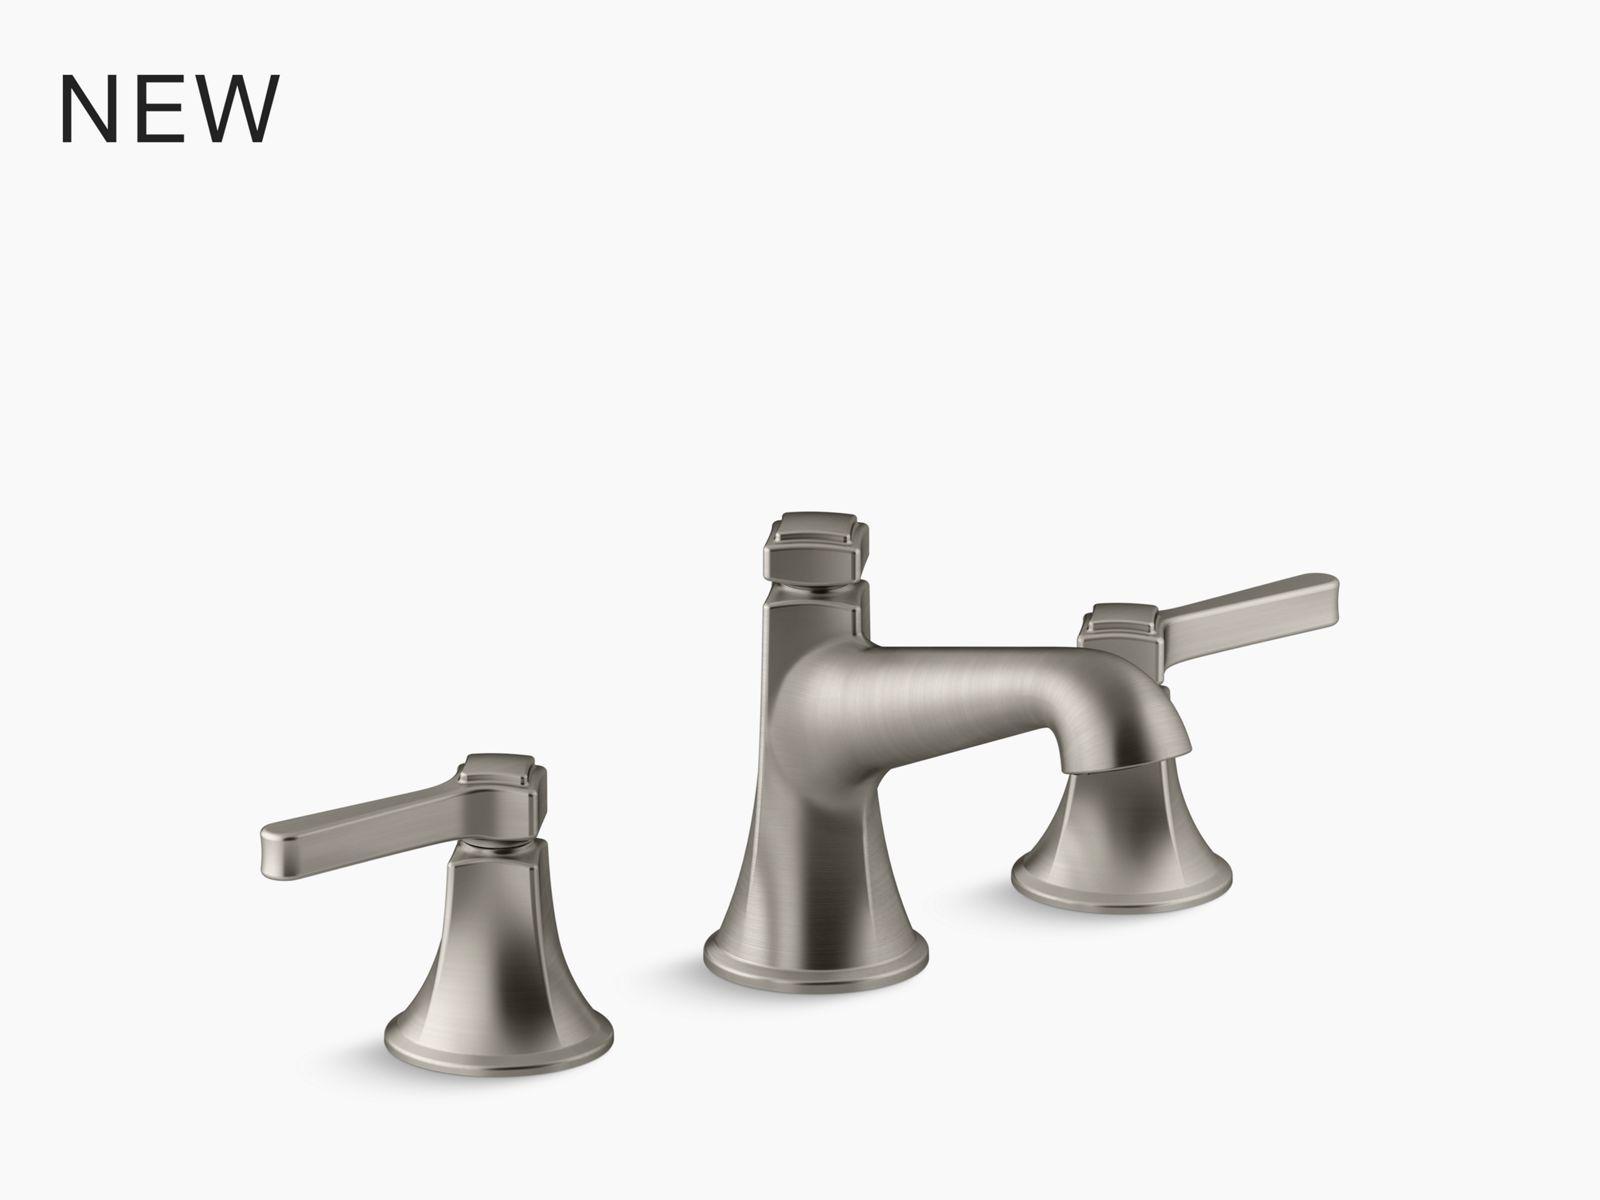 kitchen faucet 10415t b kohler